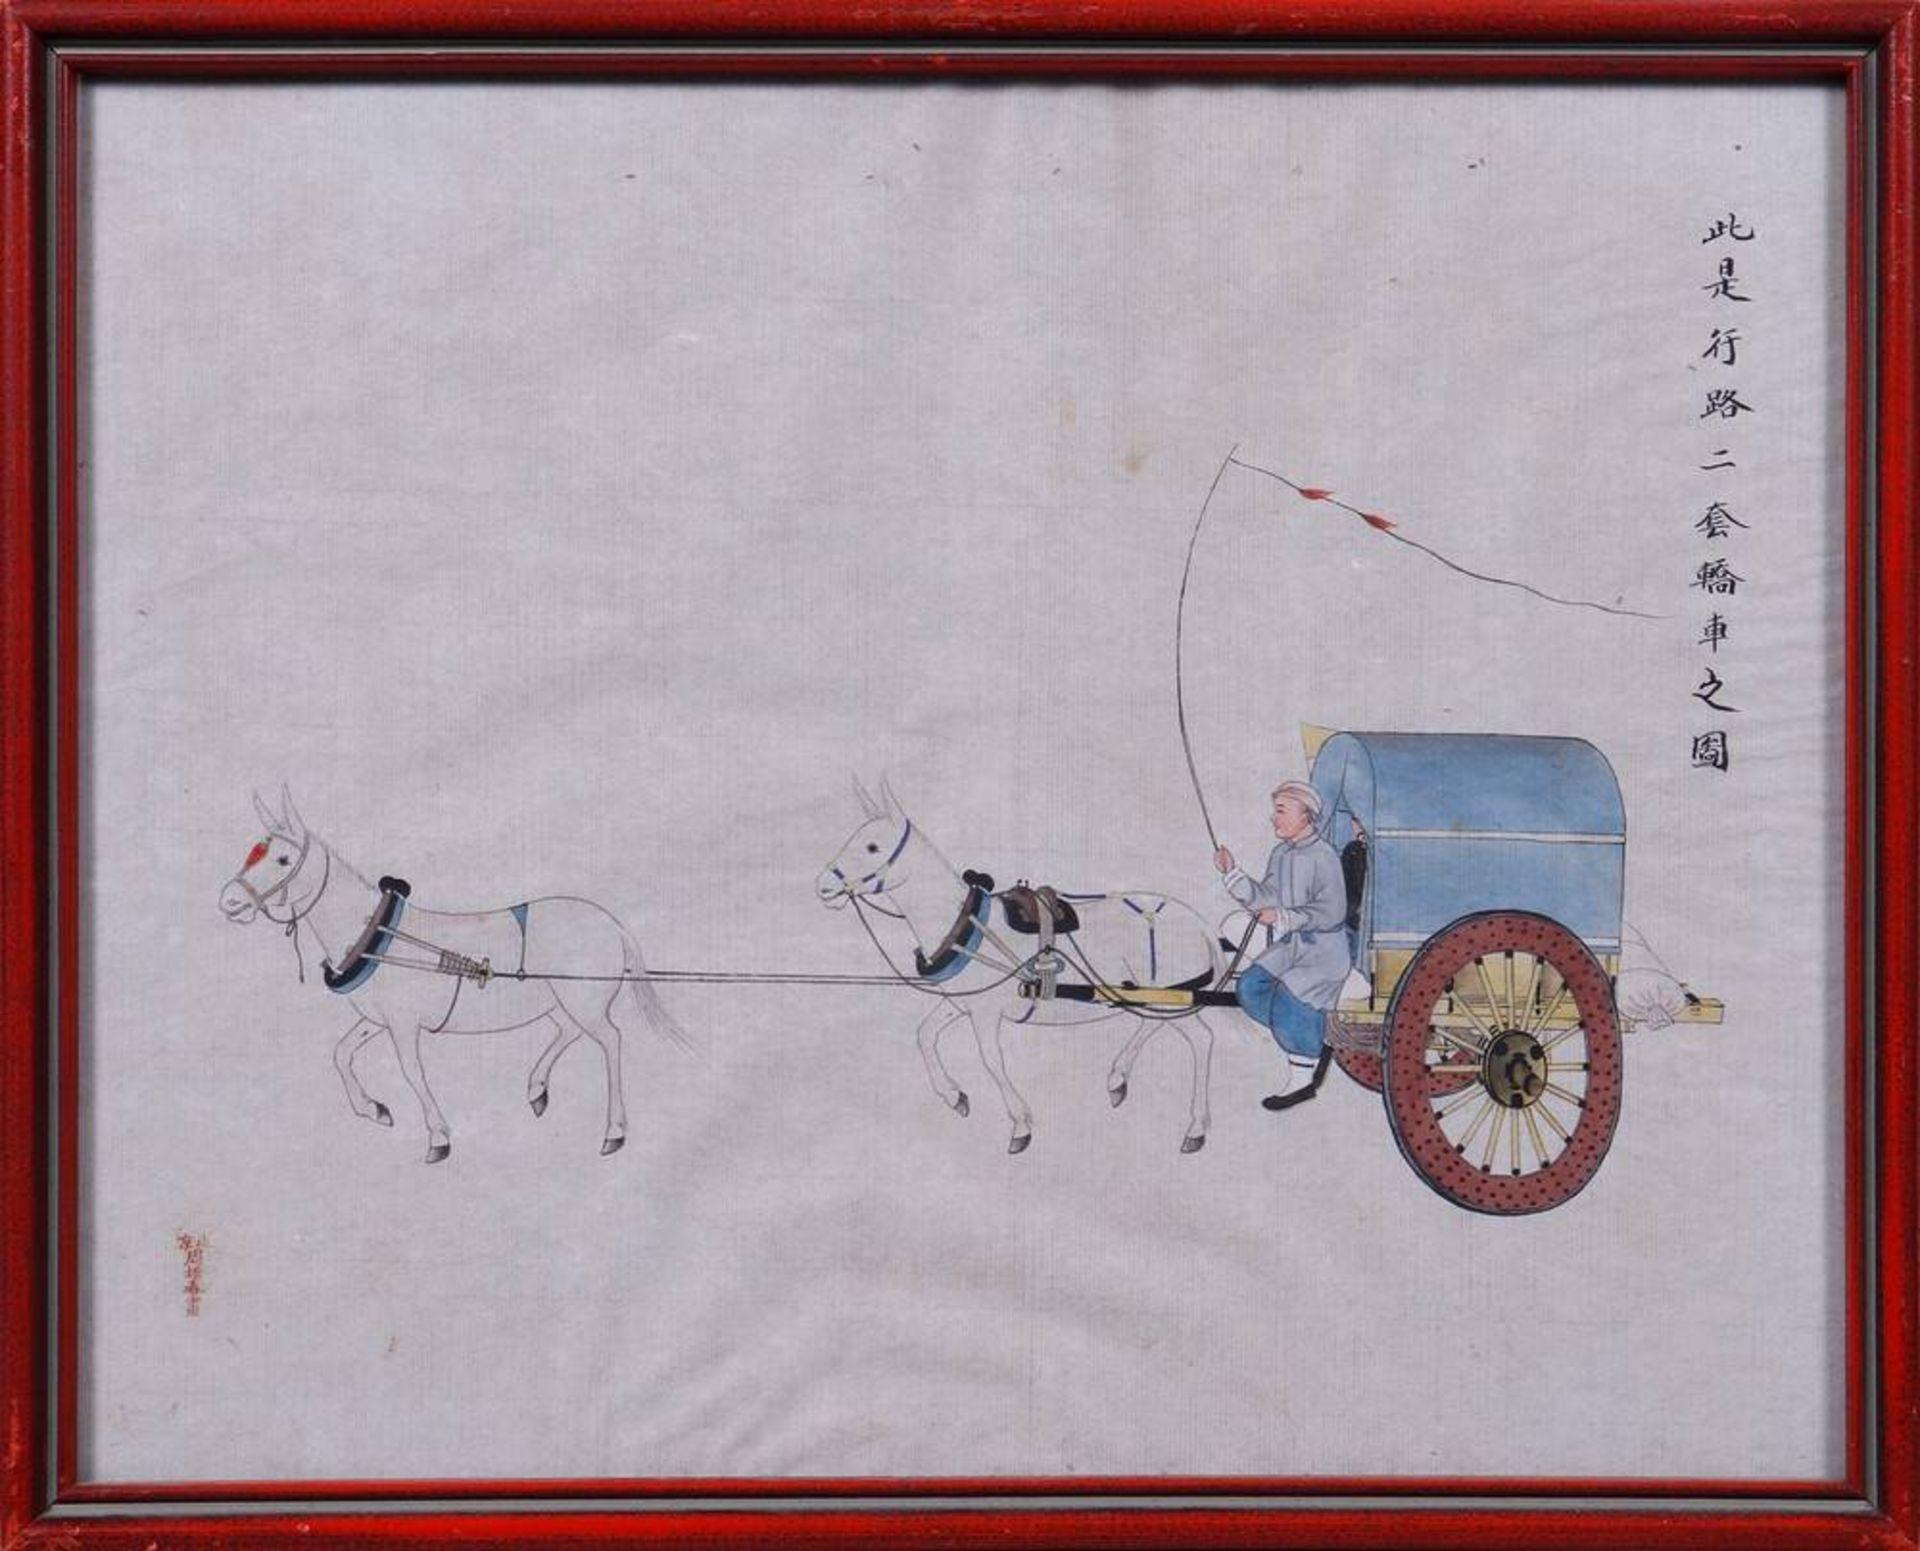 Zhou Peichun (China, tätig Ende 19.Jh./Anfang 20.Jh.) - Image 4 of 5